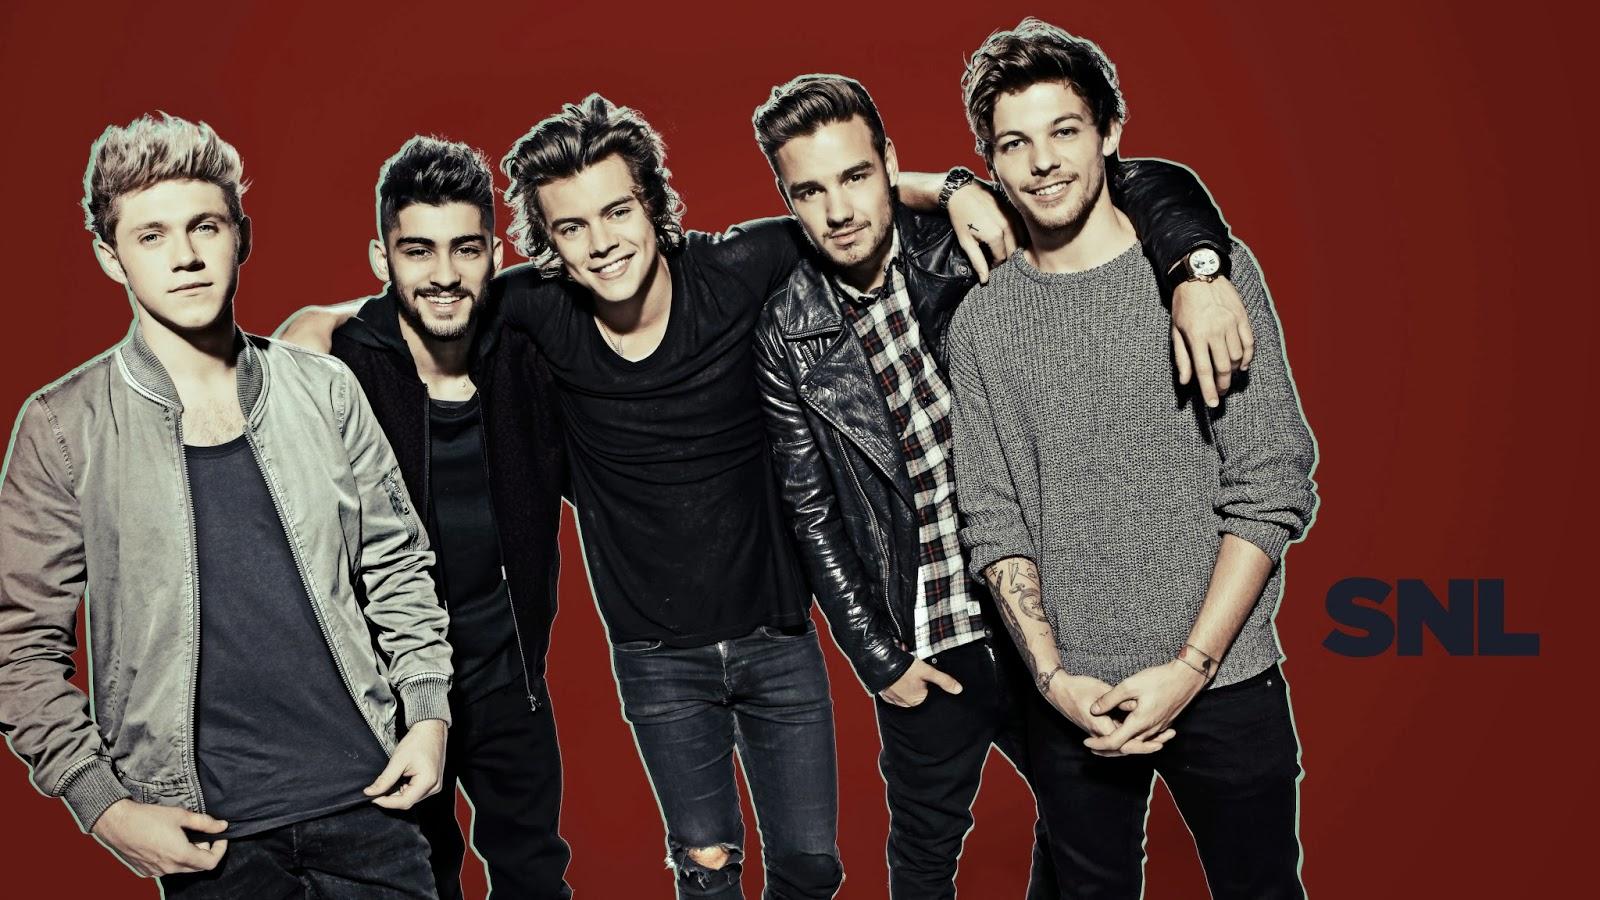 One Direction: Boys' photoshoot - 313.2KB